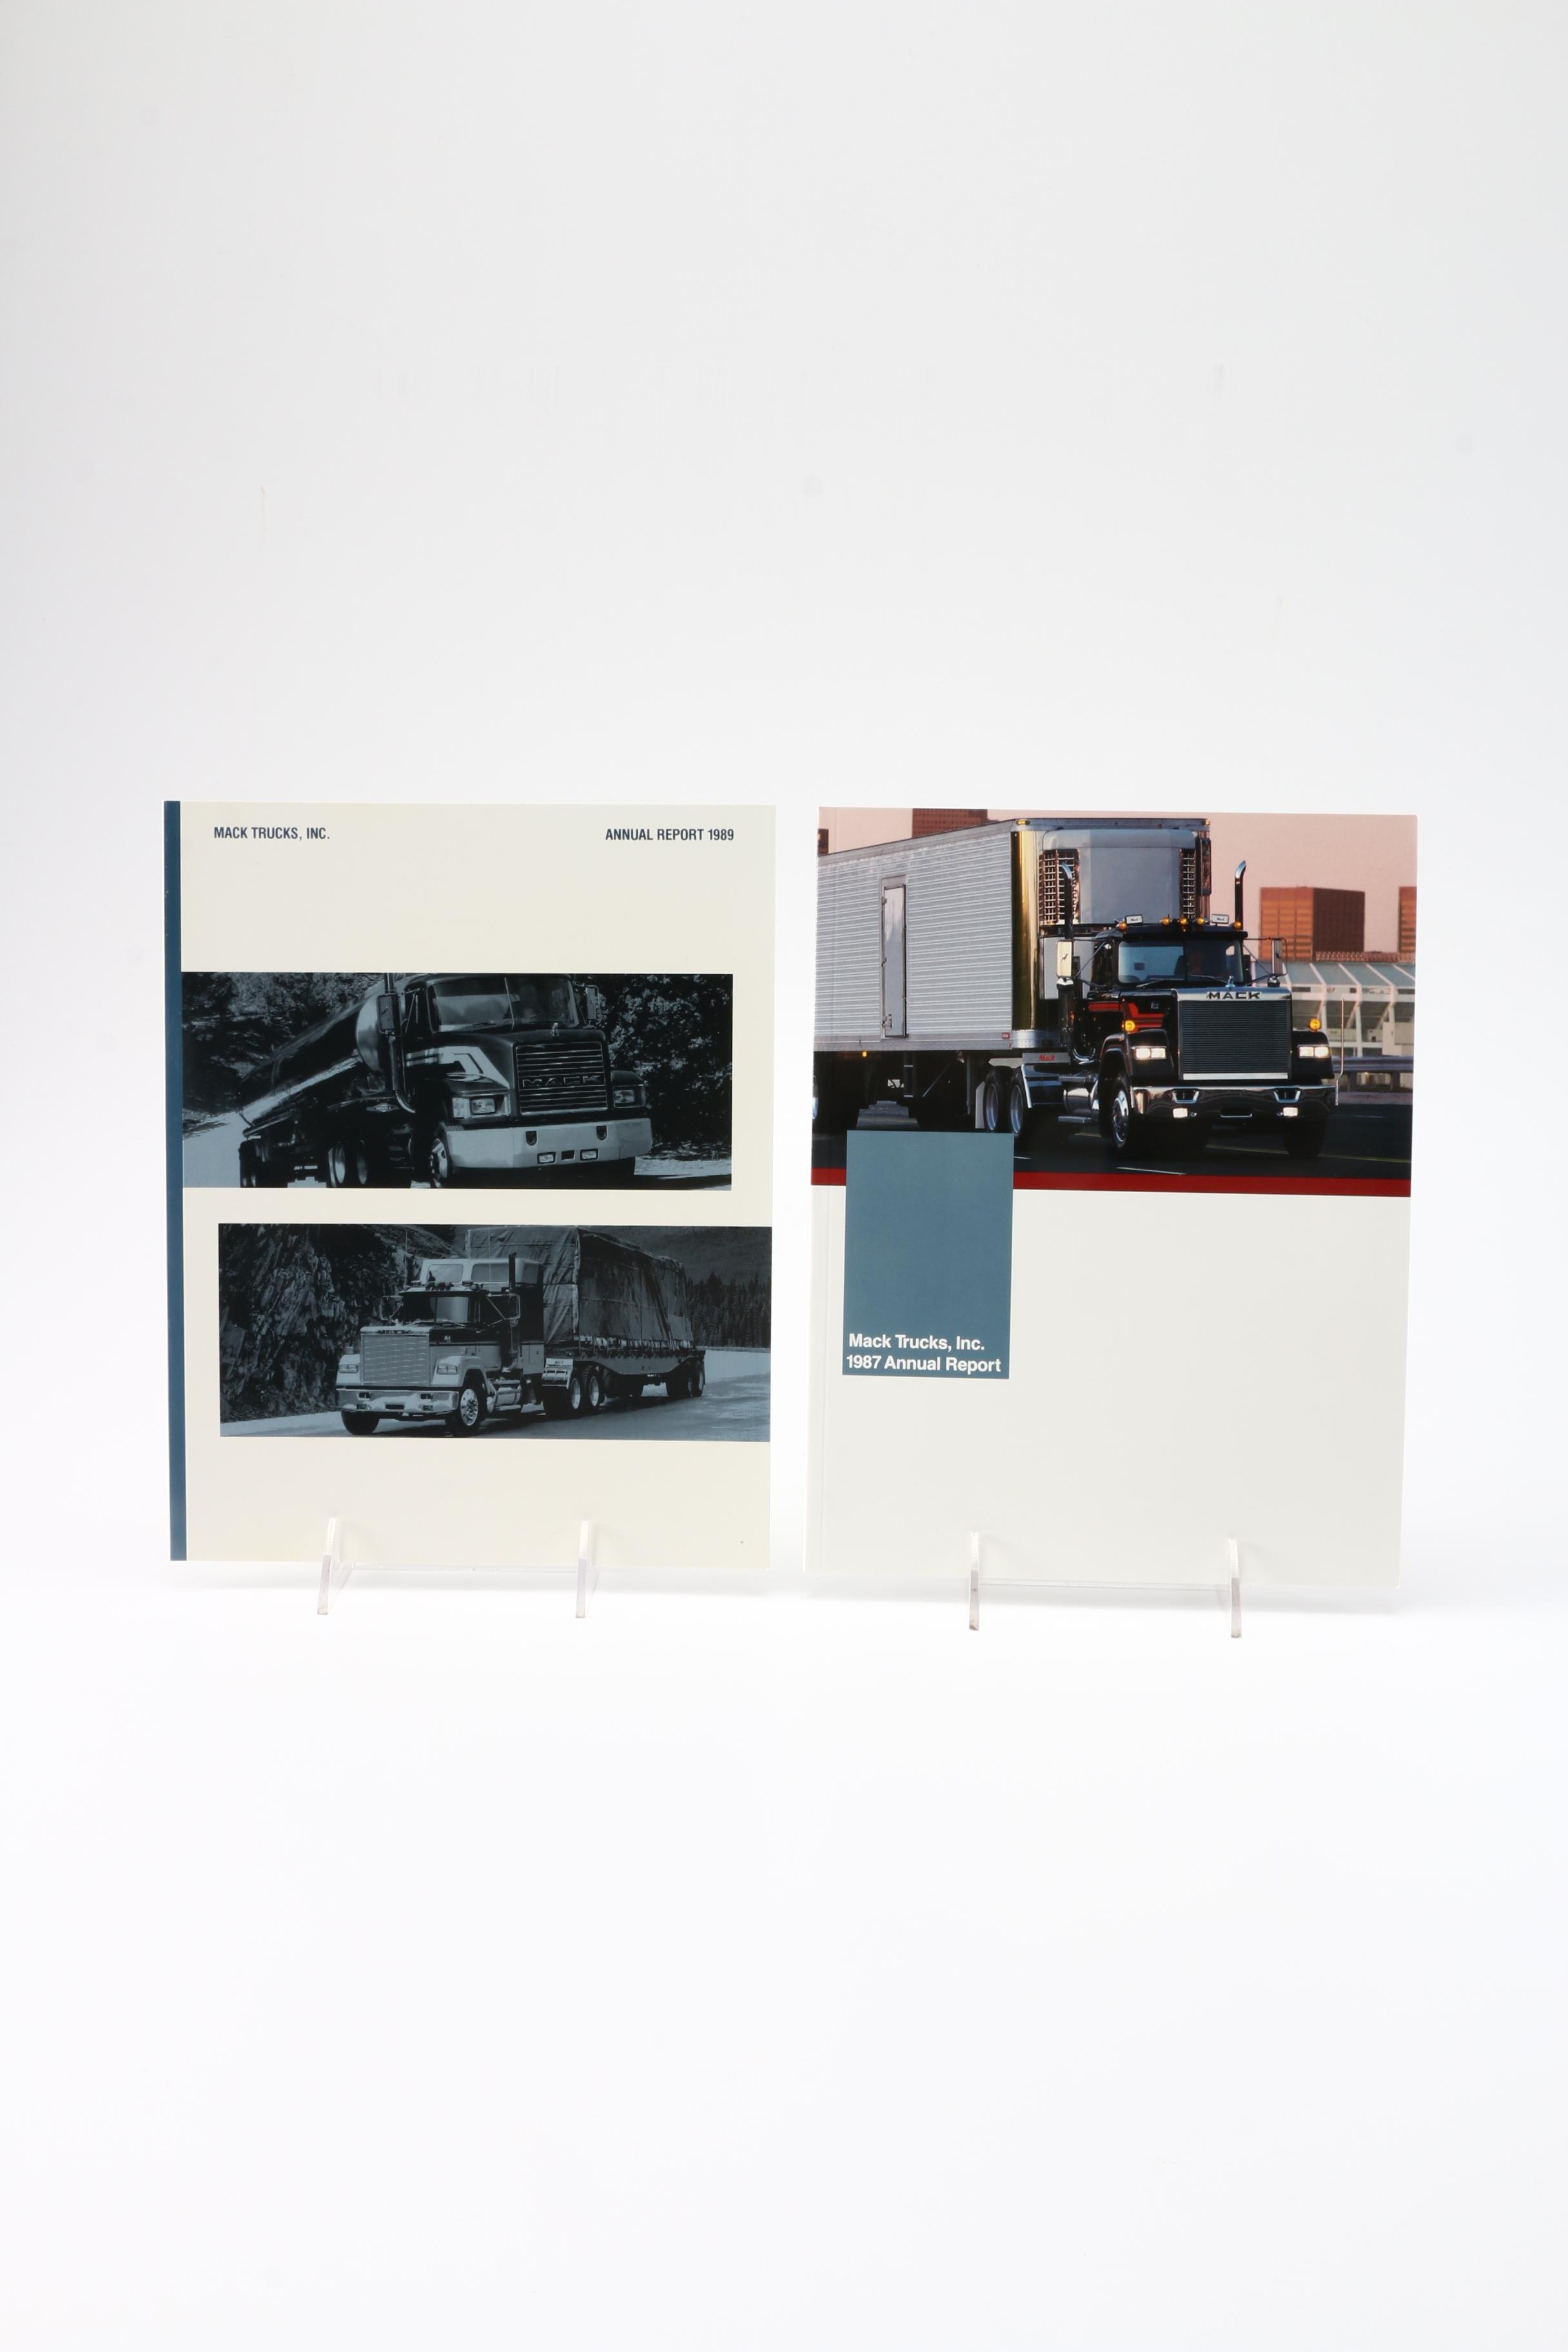 1987 and 1989 Mack Trucks, Inc. Annual Reports